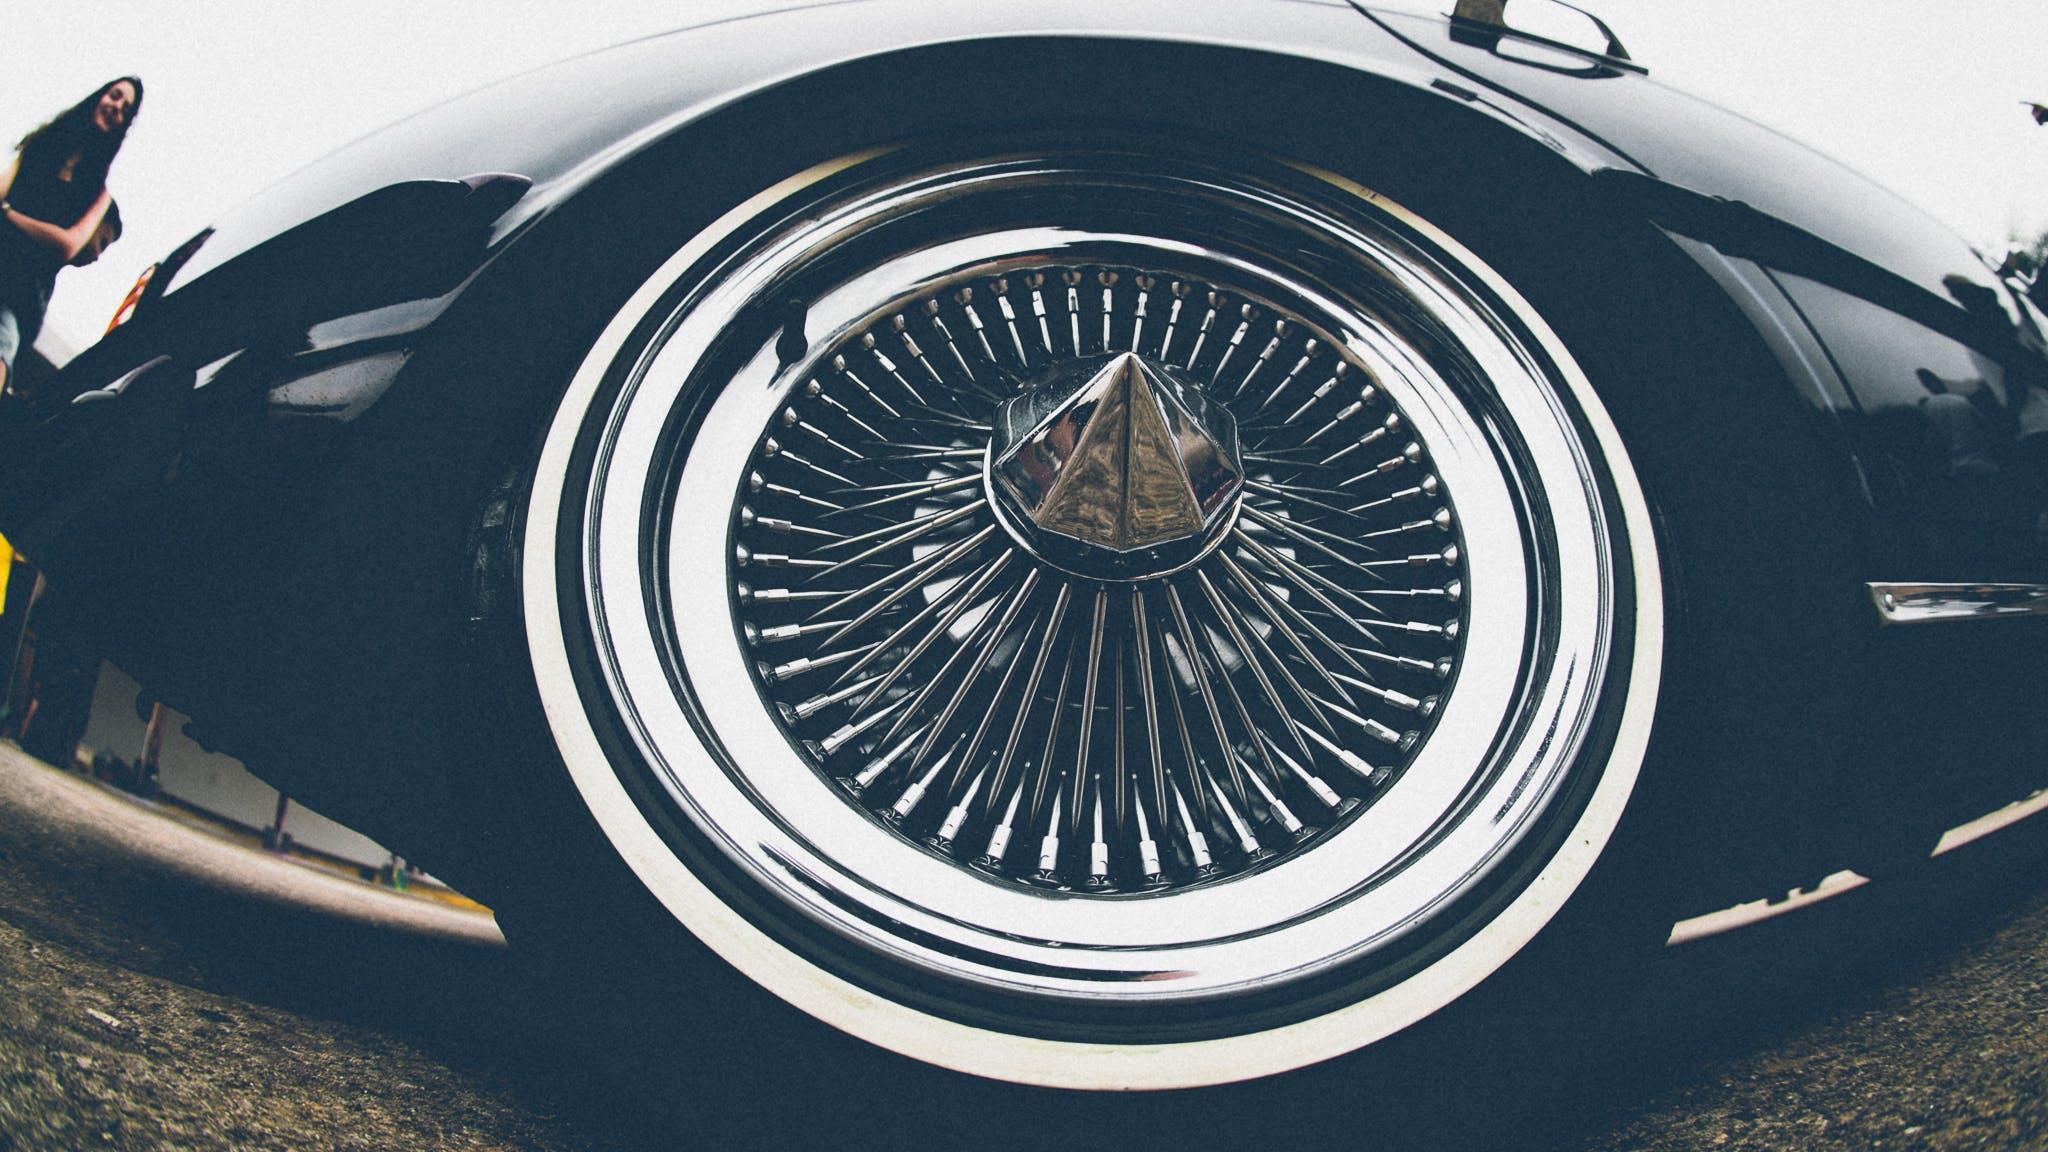 Gratis stockfoto met auto, automobiel, bmw, chroom